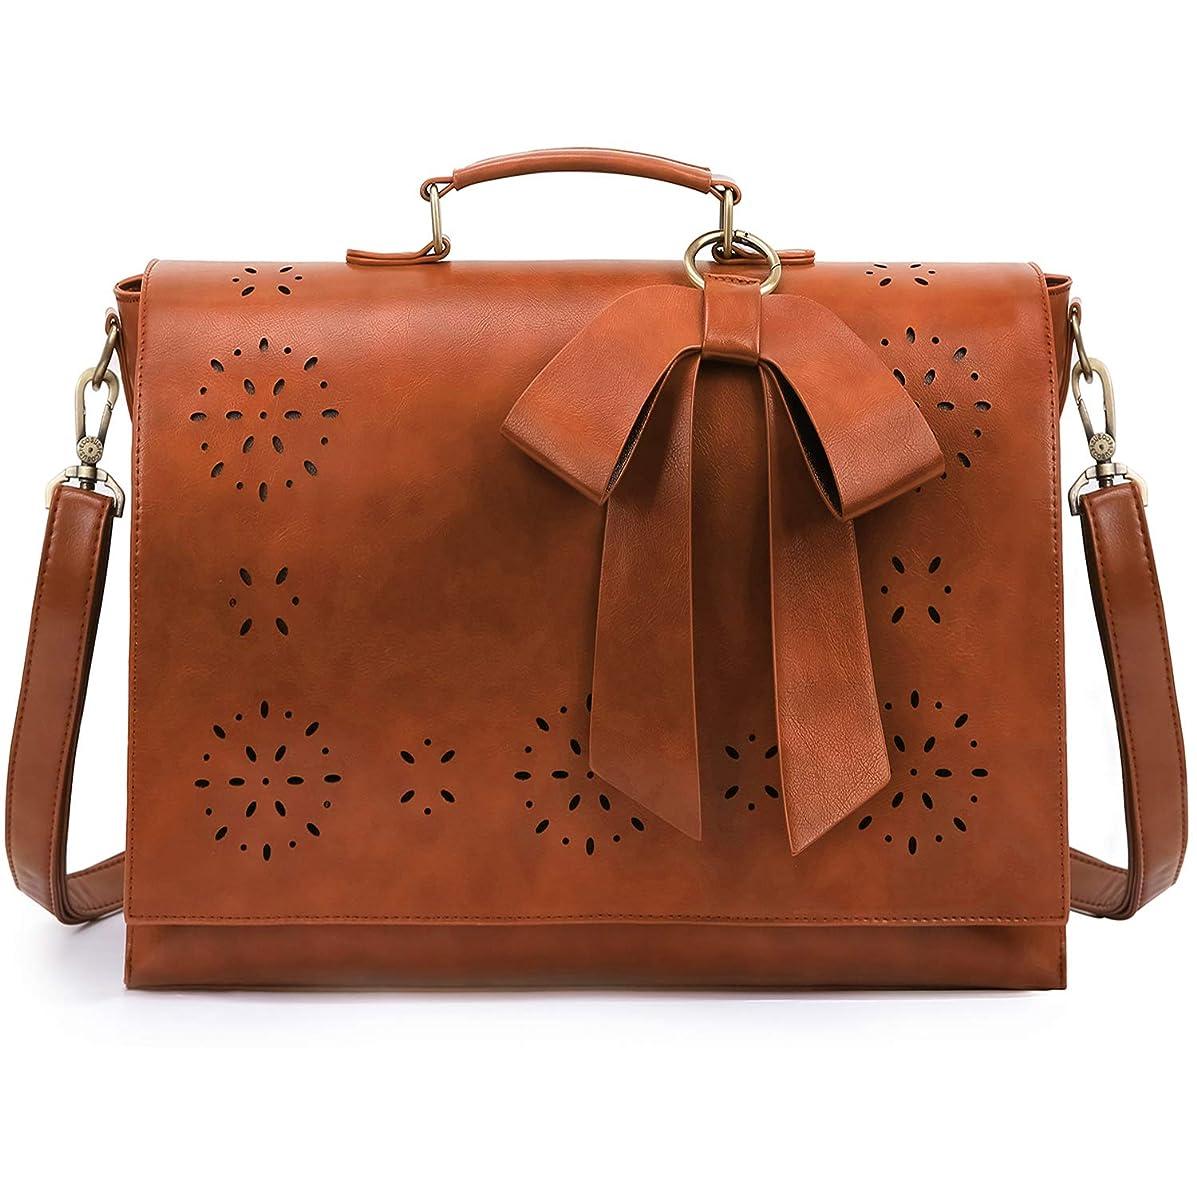 ECOSUSI Women's Briefcase PU Leather 15.6 inch Laptop Bag Shoulder Computer Satchel Bag with Detachable Bow, Light Brown